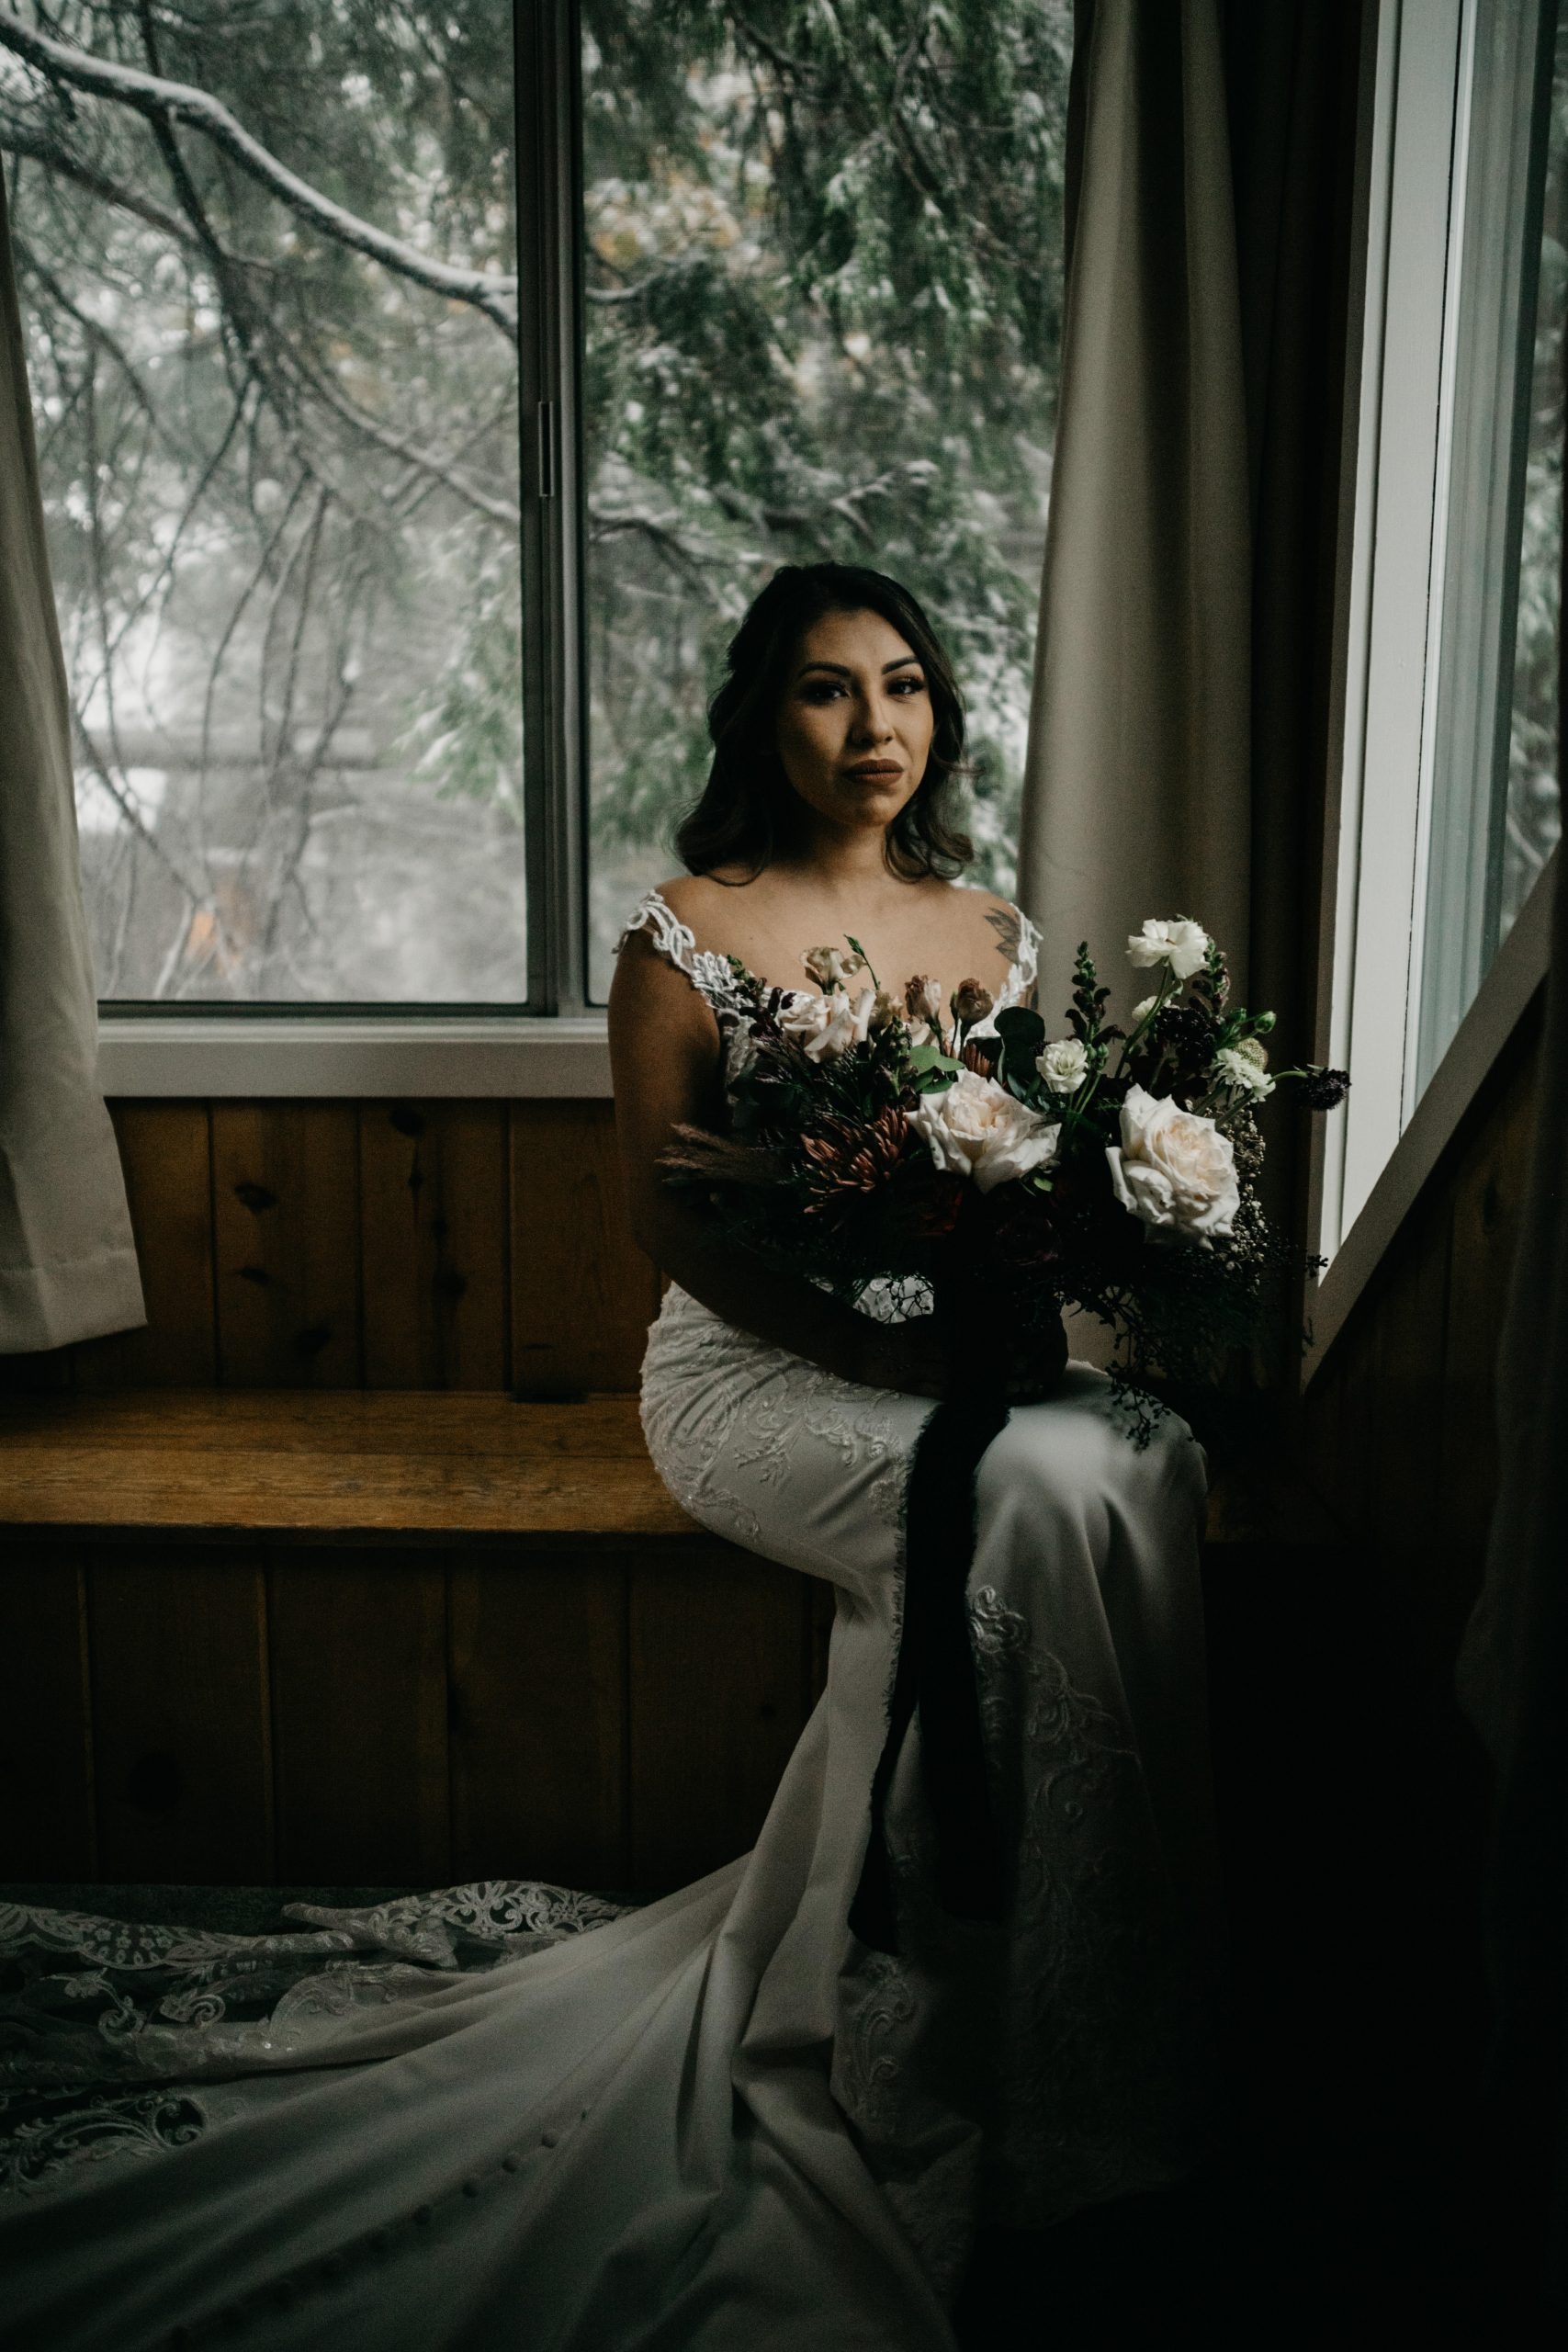 Bride Portrait in Arrowhead Pine Rose Cabin, image by Fatima Elreda Photo